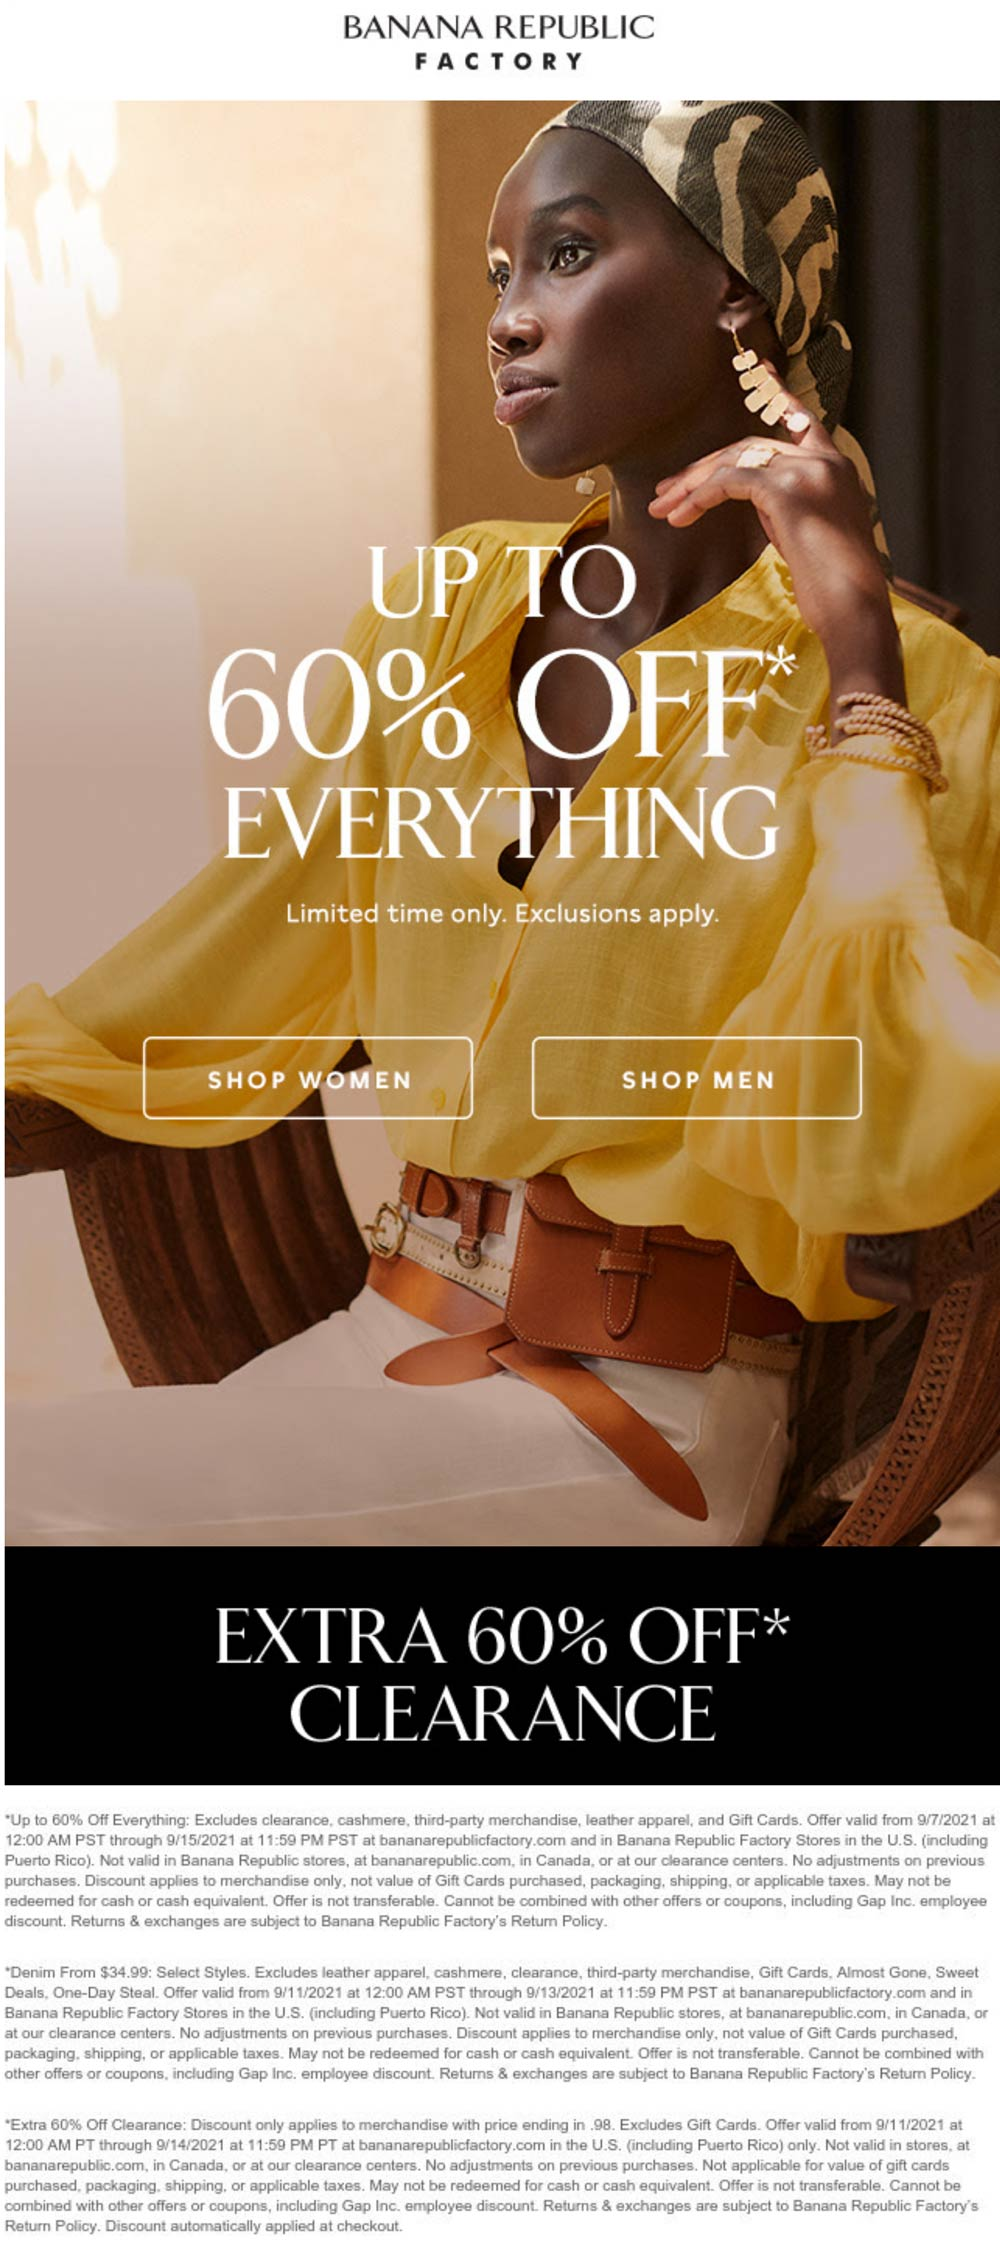 Banana Republic Factory stores Coupon  Extra 60% off clearance & more online at Banana Republic Factory #bananarepublicfactory